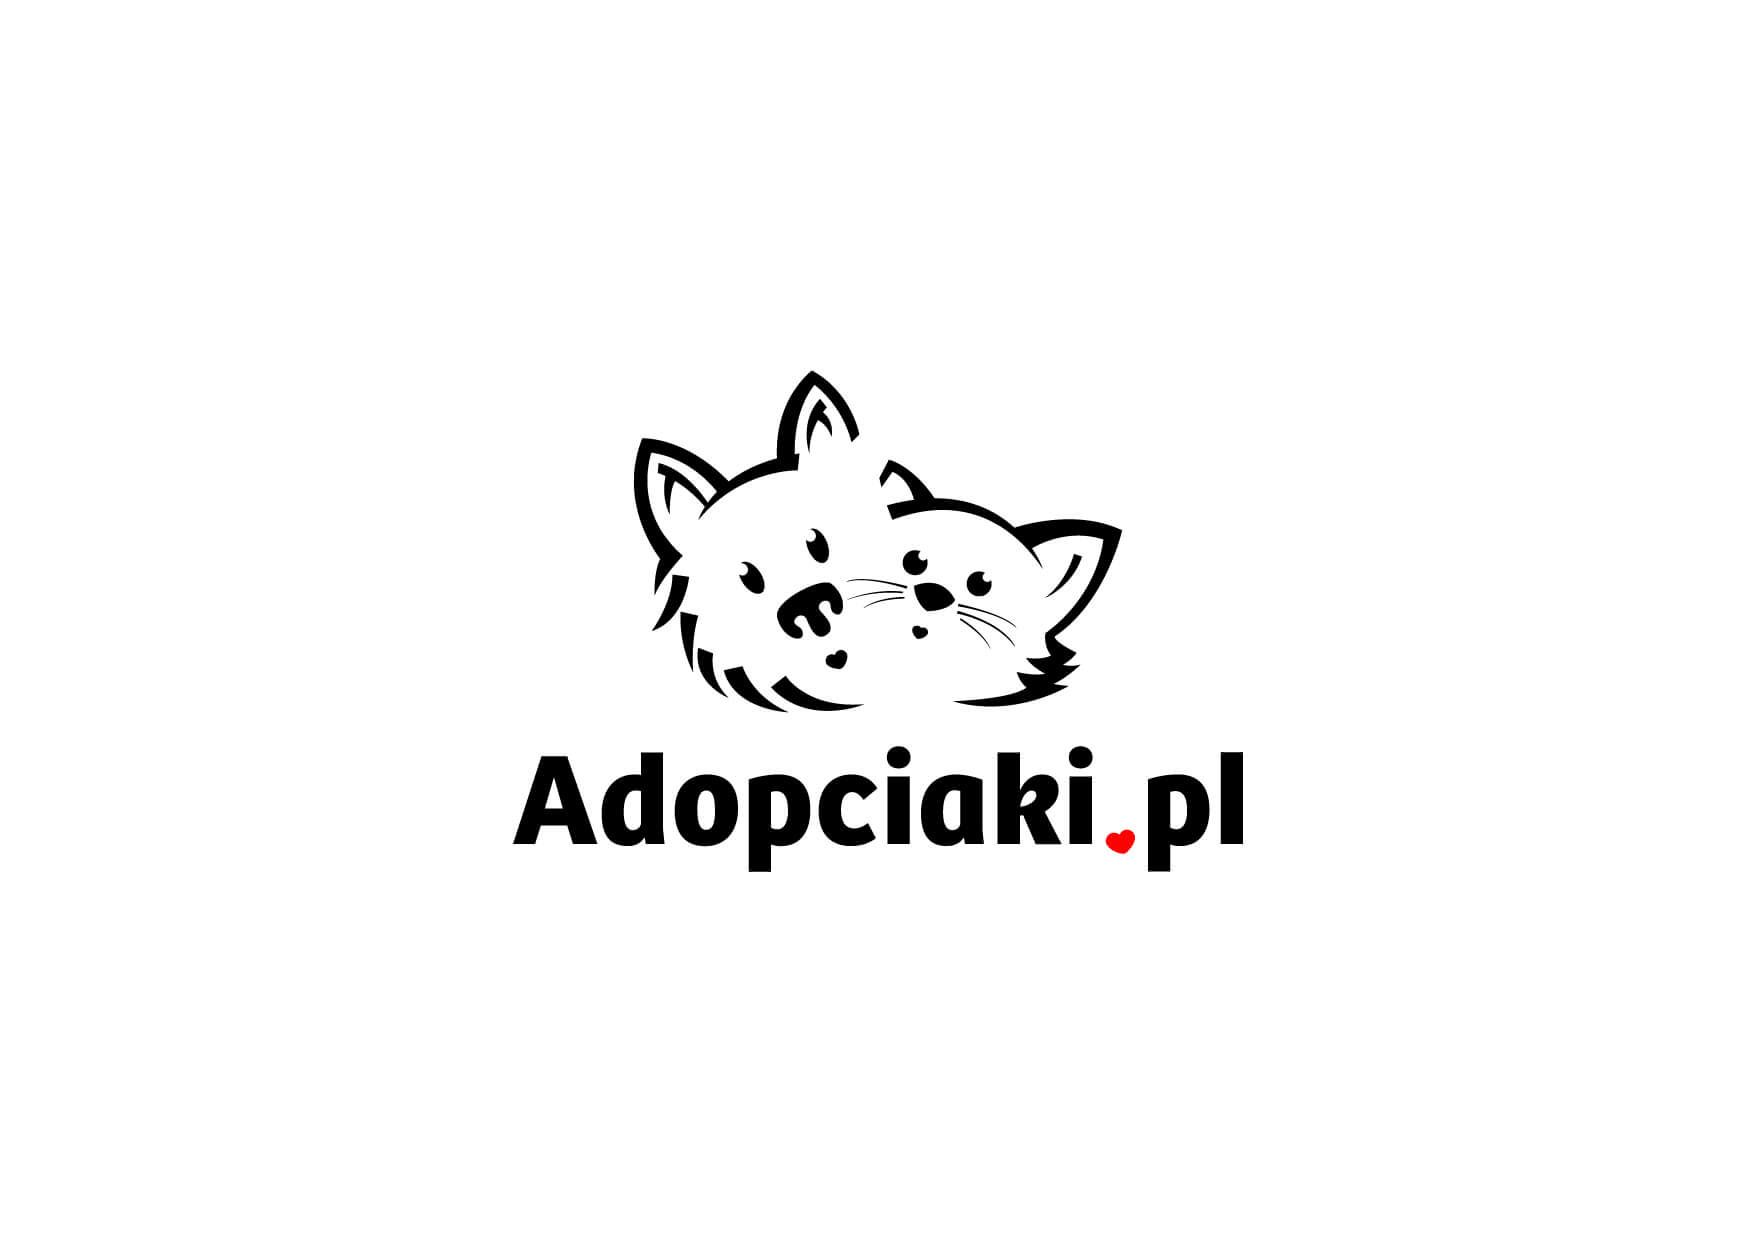 Logo Adopciaki.pl – Warszawa